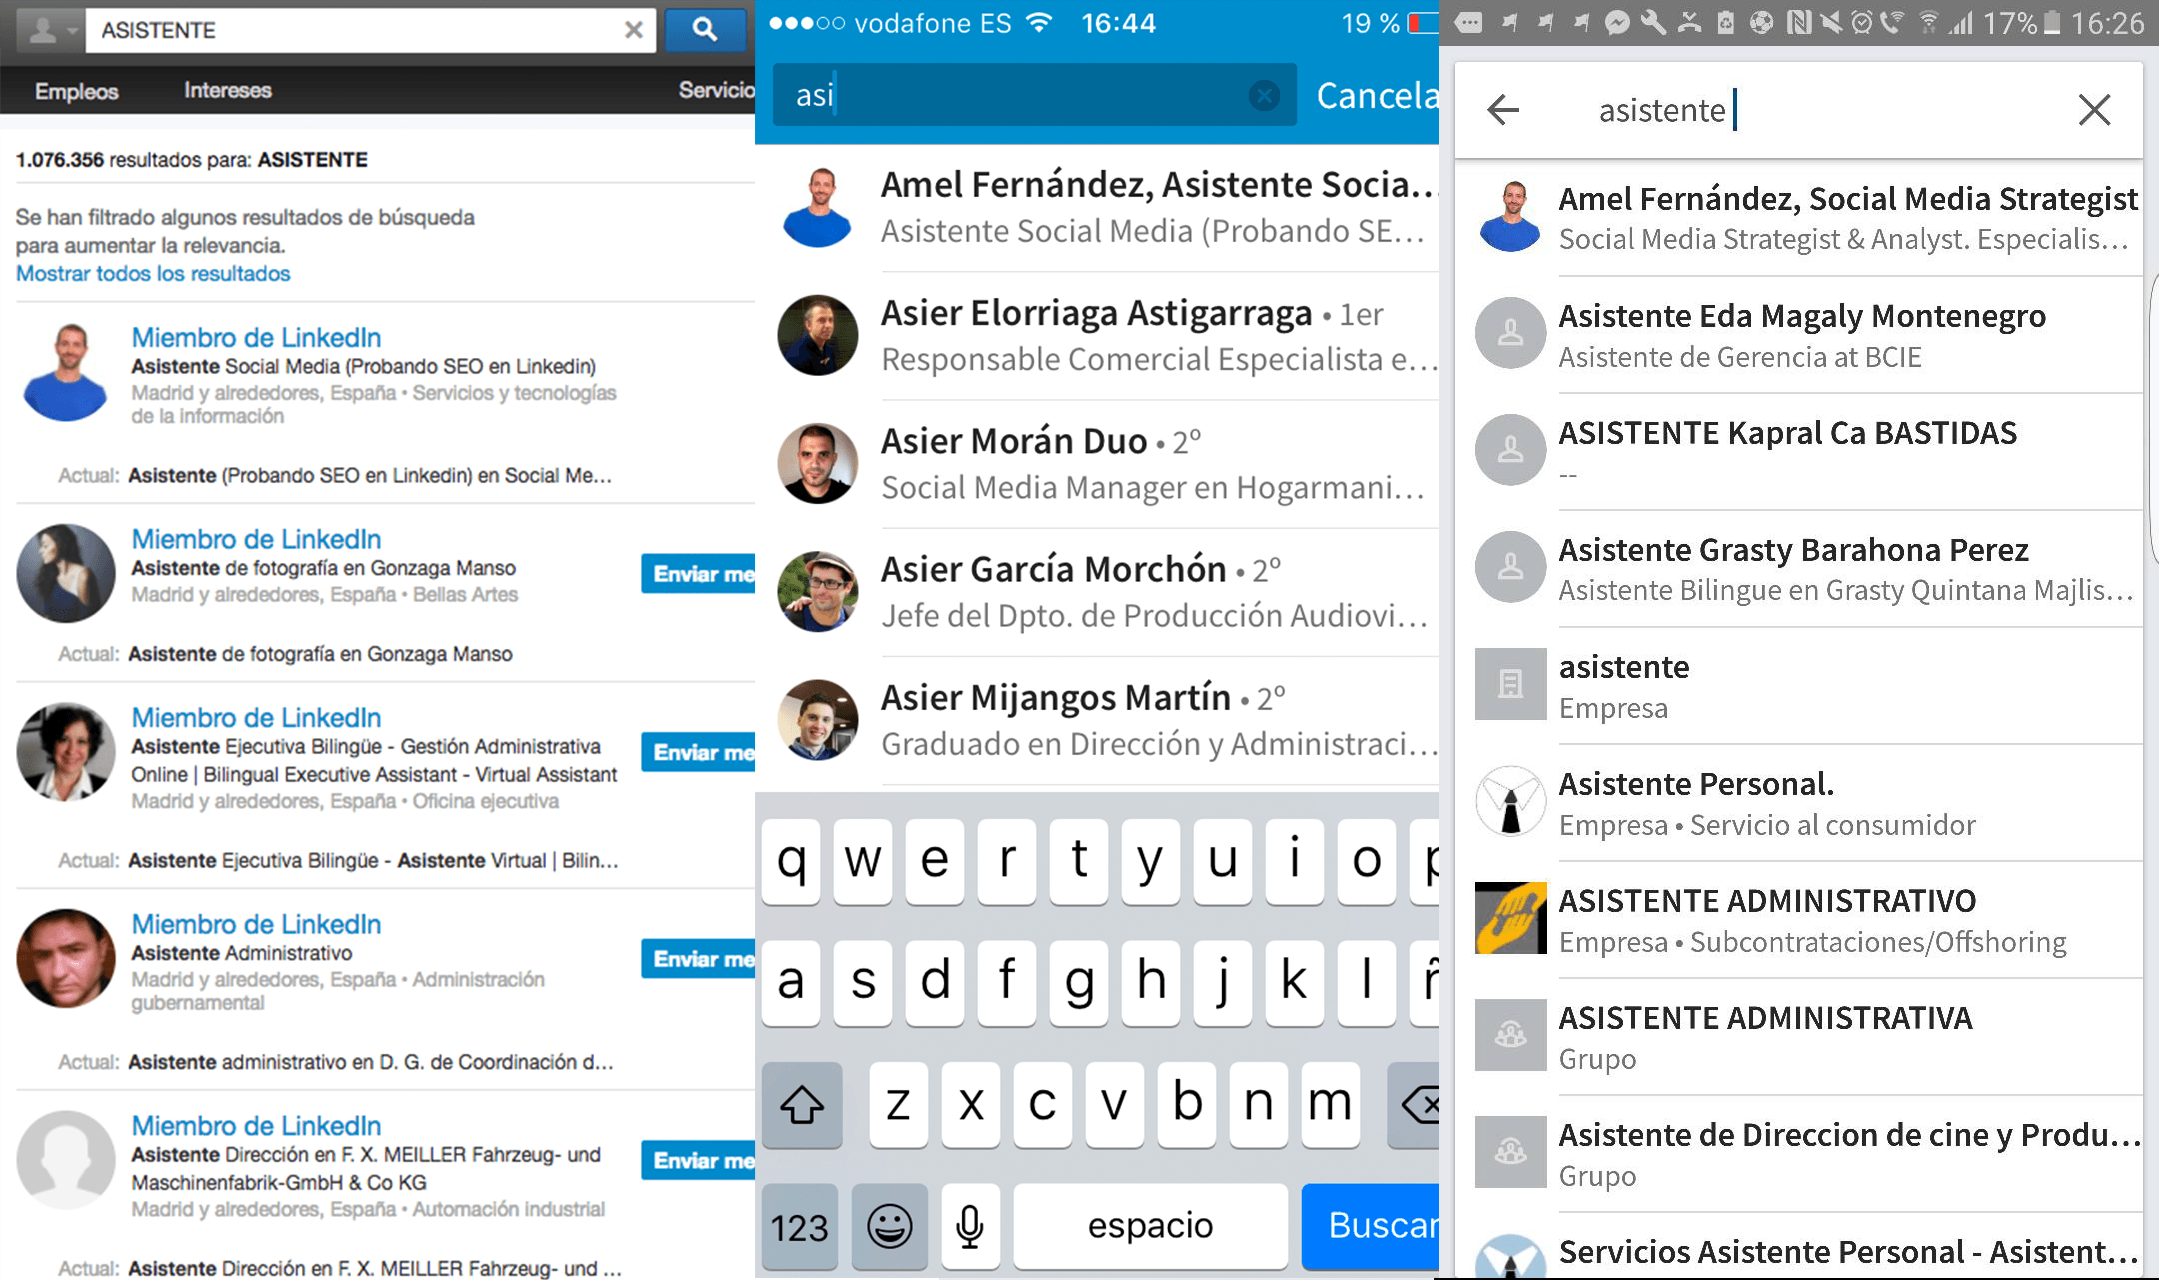 SEO en Linkedin - Asistente 2